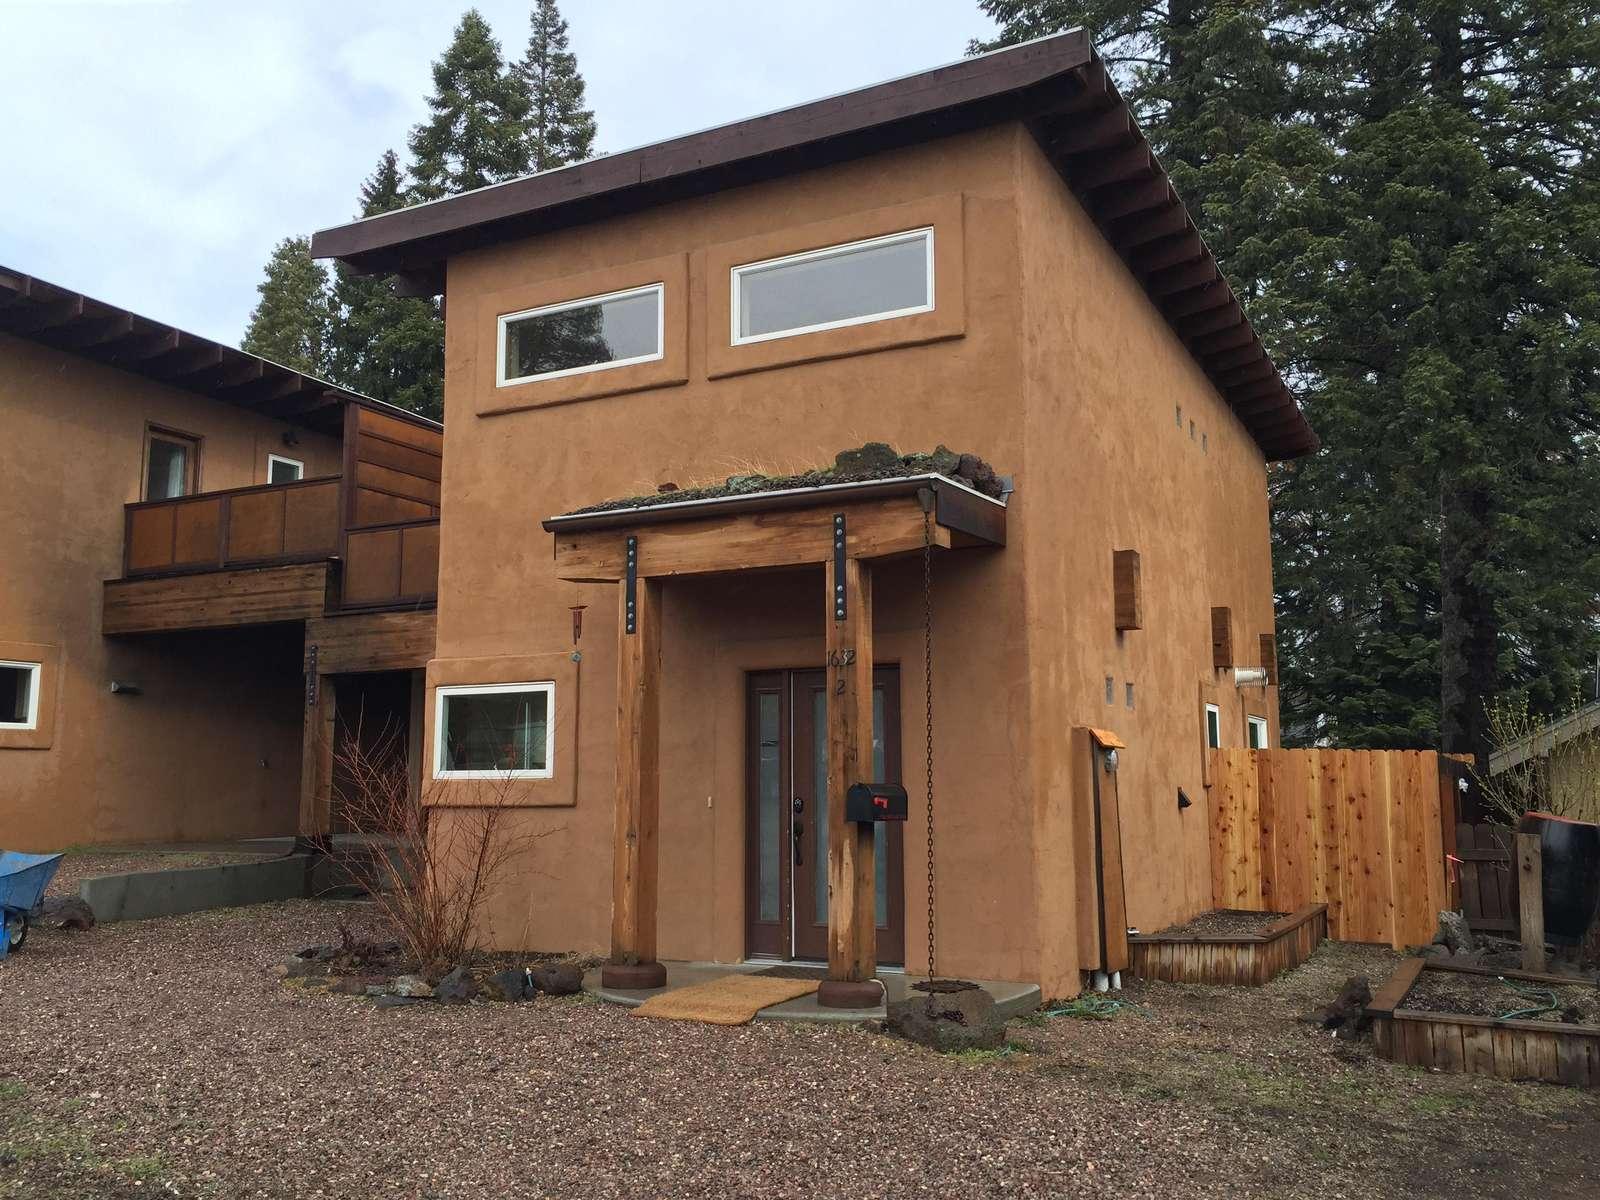 Casa Luna on Bend's westside...a modern stucco charmer - property